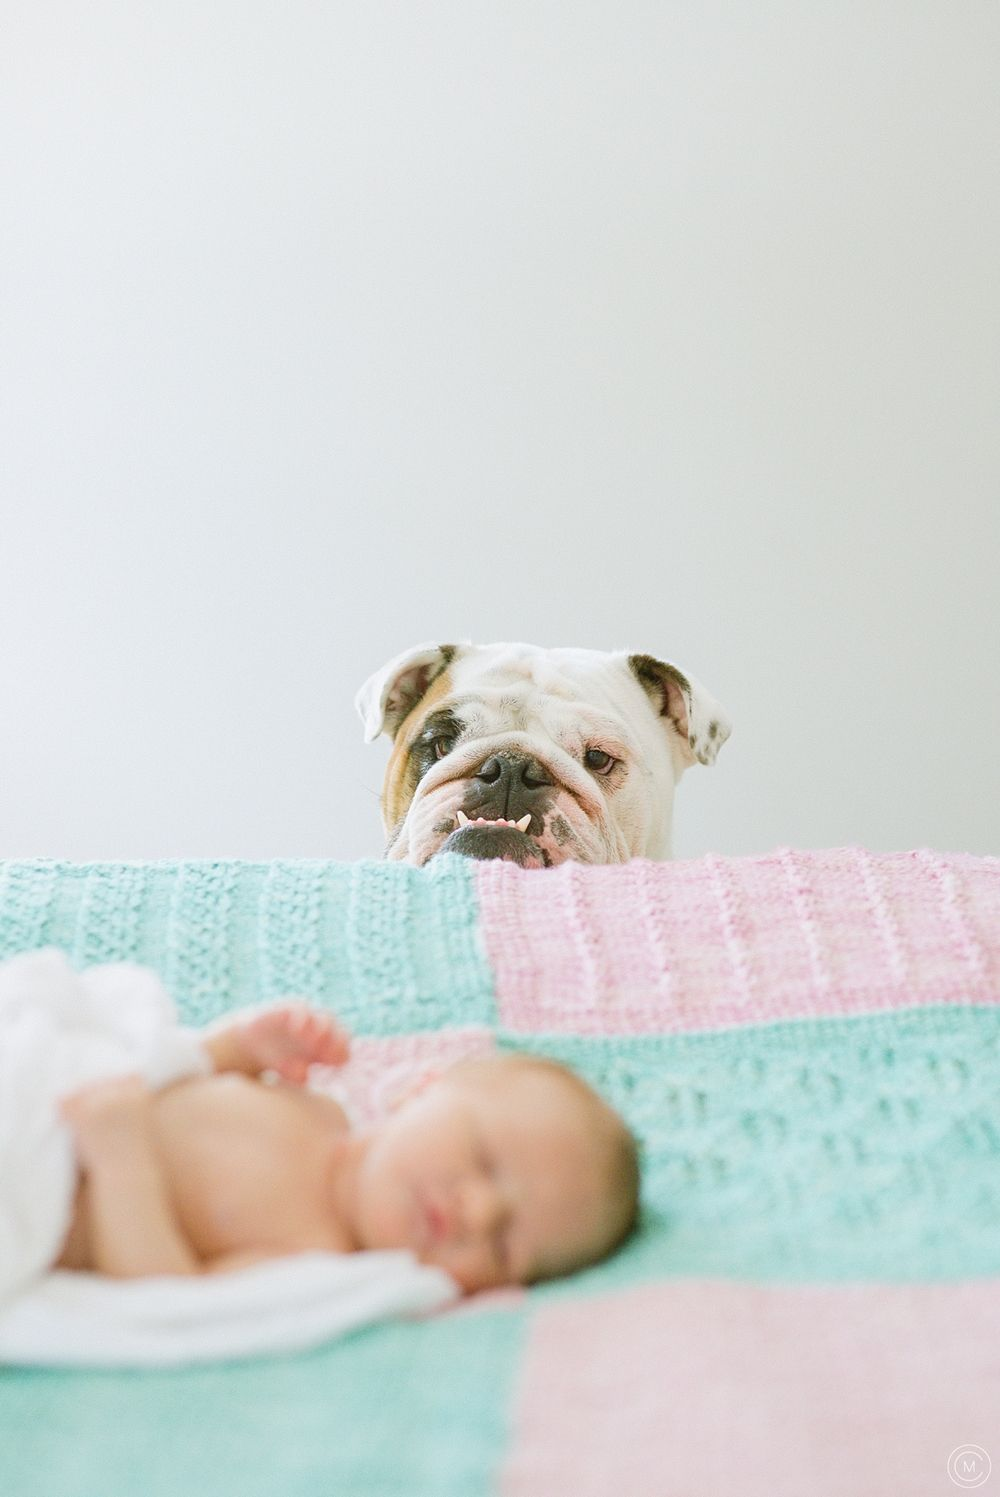 Newborn Baby Bulldogs : newborn, bulldogs, Sweet, Newborn, Session, English, Bulldog, Kids,, Lover,